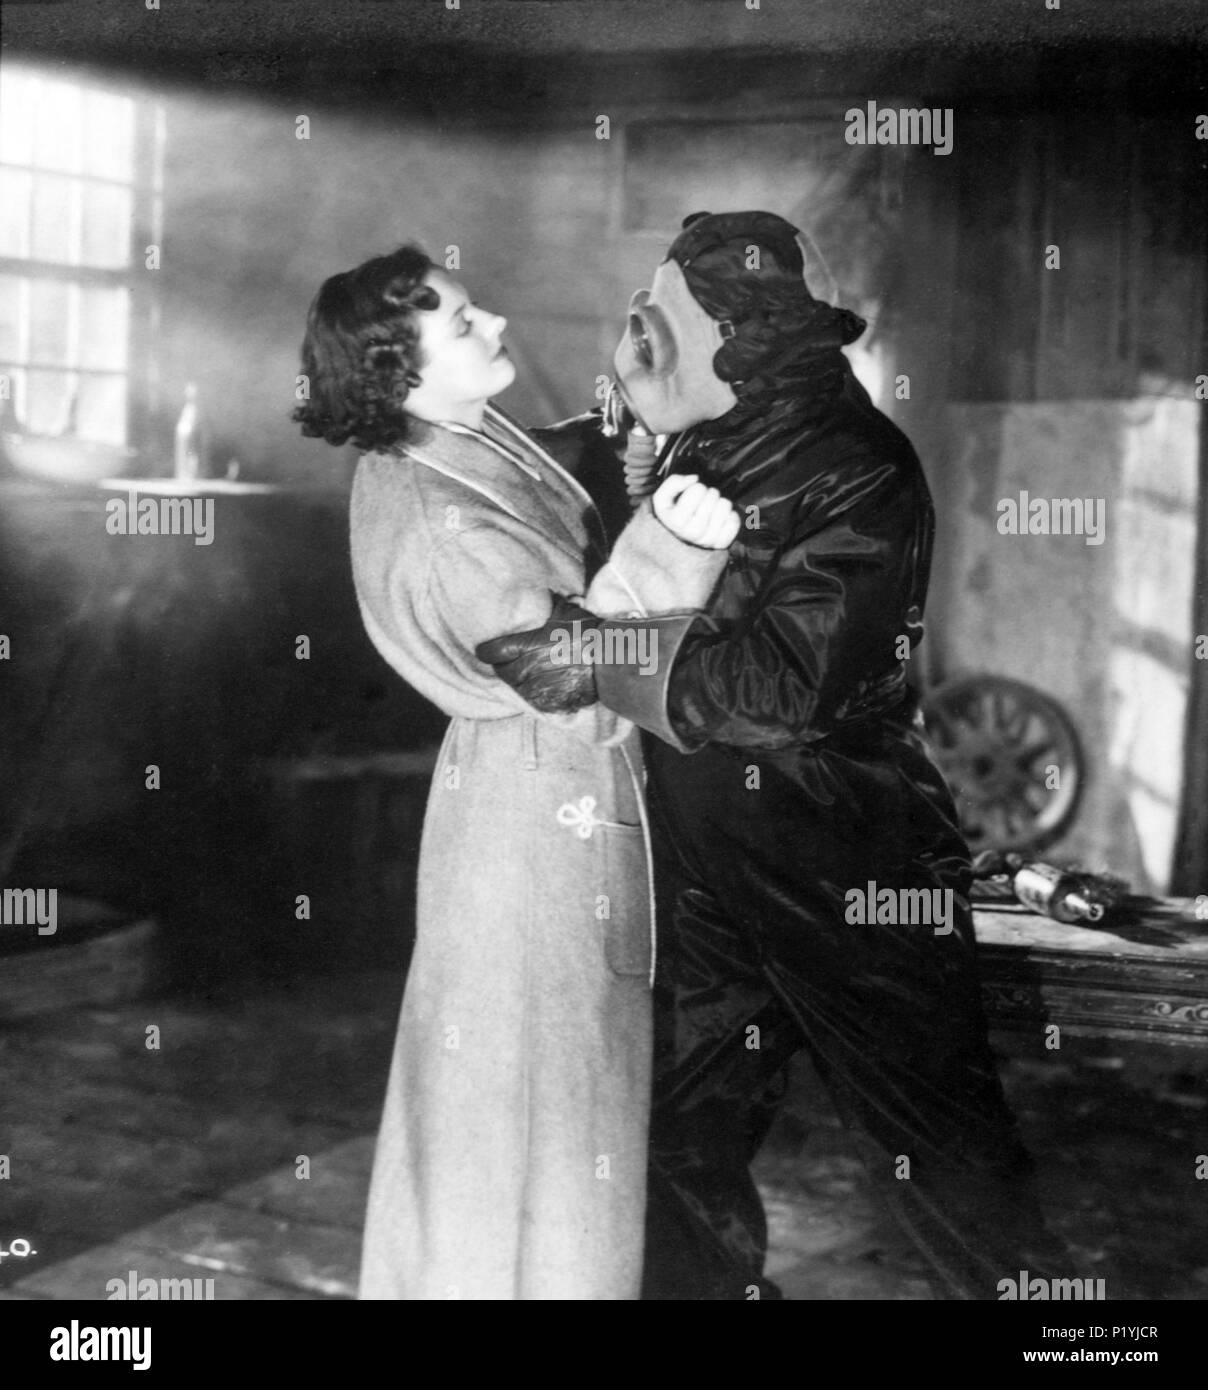 Original Film Title: THE FROG.  English Title: THE FROG.  Film Director: JACK RAYMOND.  Year: 1936. Credit: HERBERT WILCOX PRODUCTIONS LTD. / Album - Stock Image